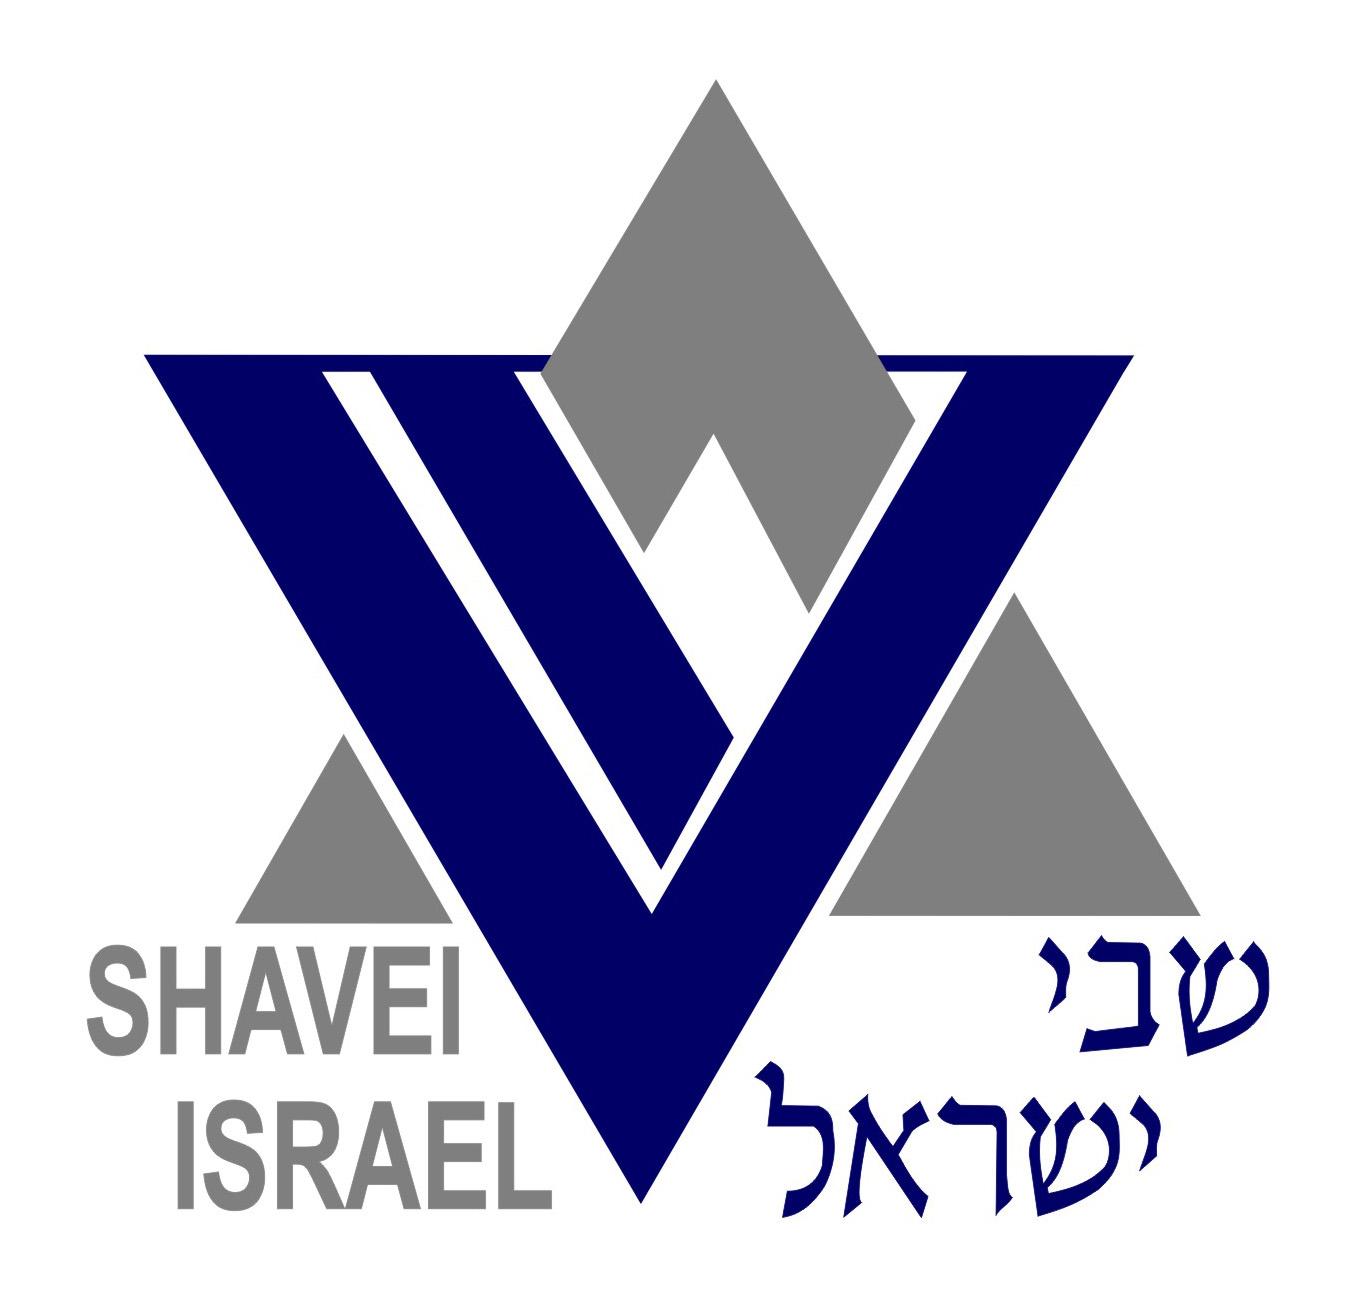 Resultado de imagem para SHAVEI ISRAEL